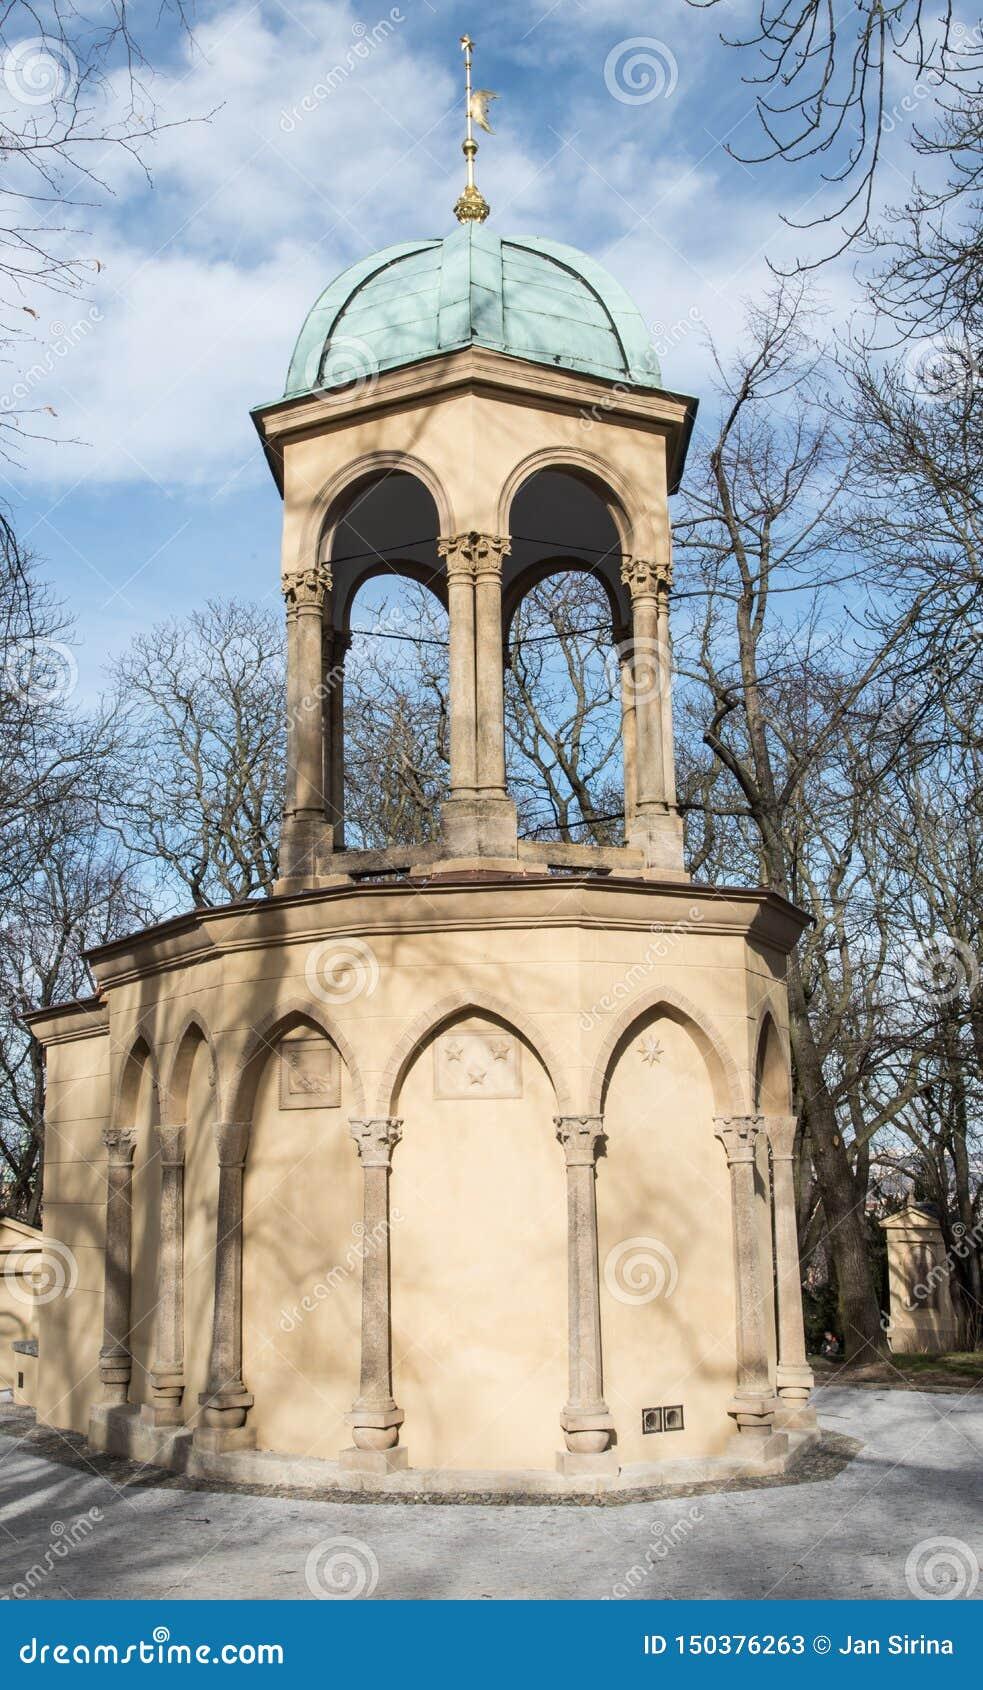 Kaple Boziho hrobu på den Petrin kullen i den Praha staden i Tjeckien